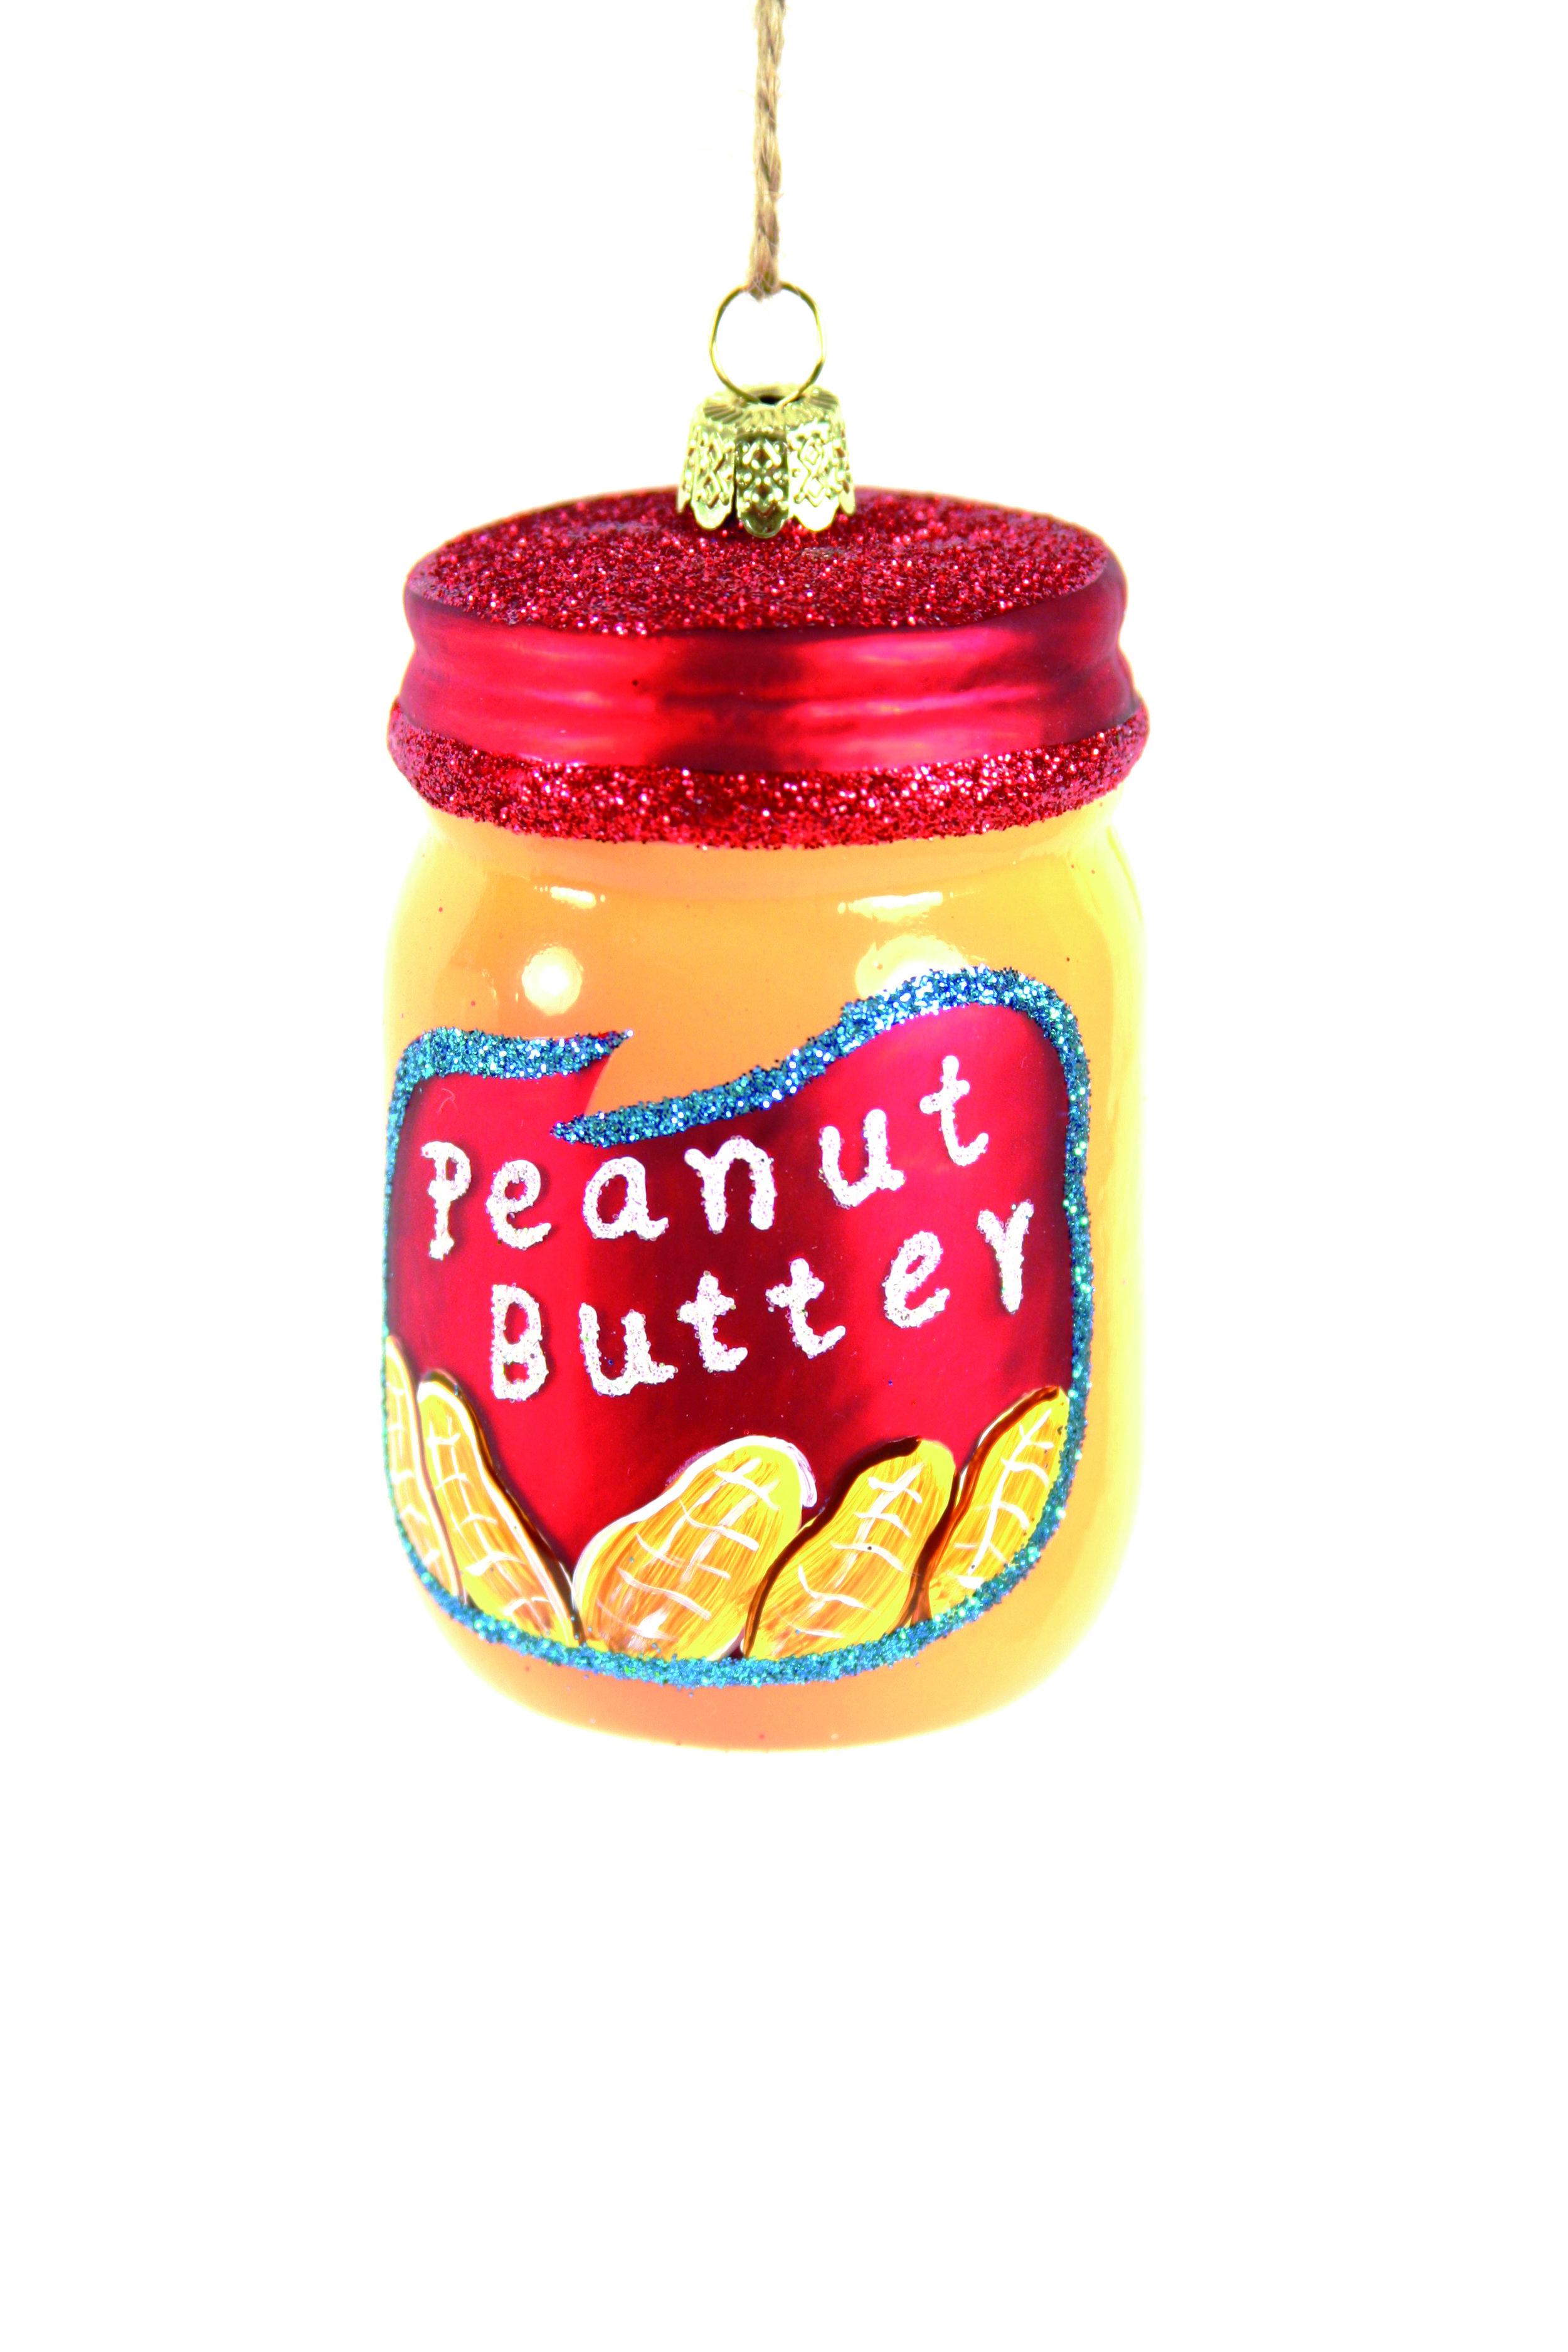 W.A. Green Cody Foster Peanut Butter Decoration, £14.jpg